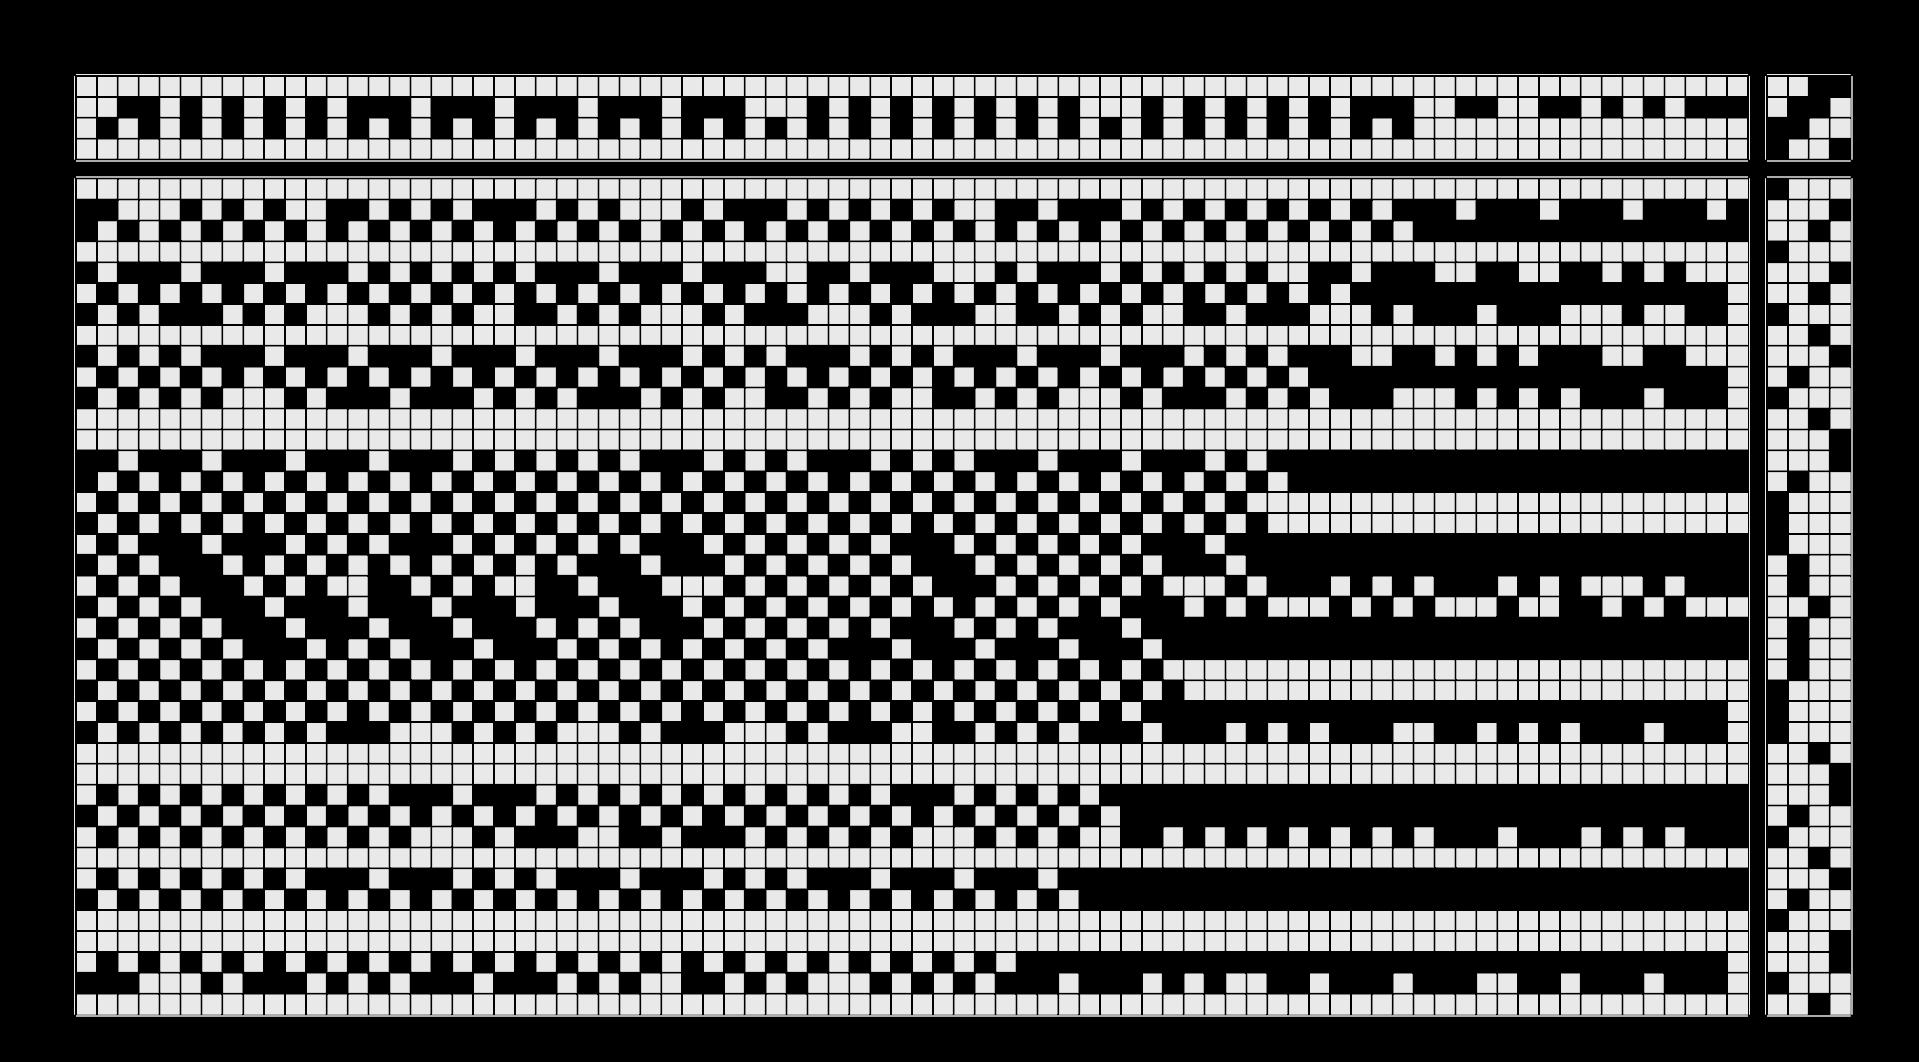 Screenshot_2020-05-07_14-48-22